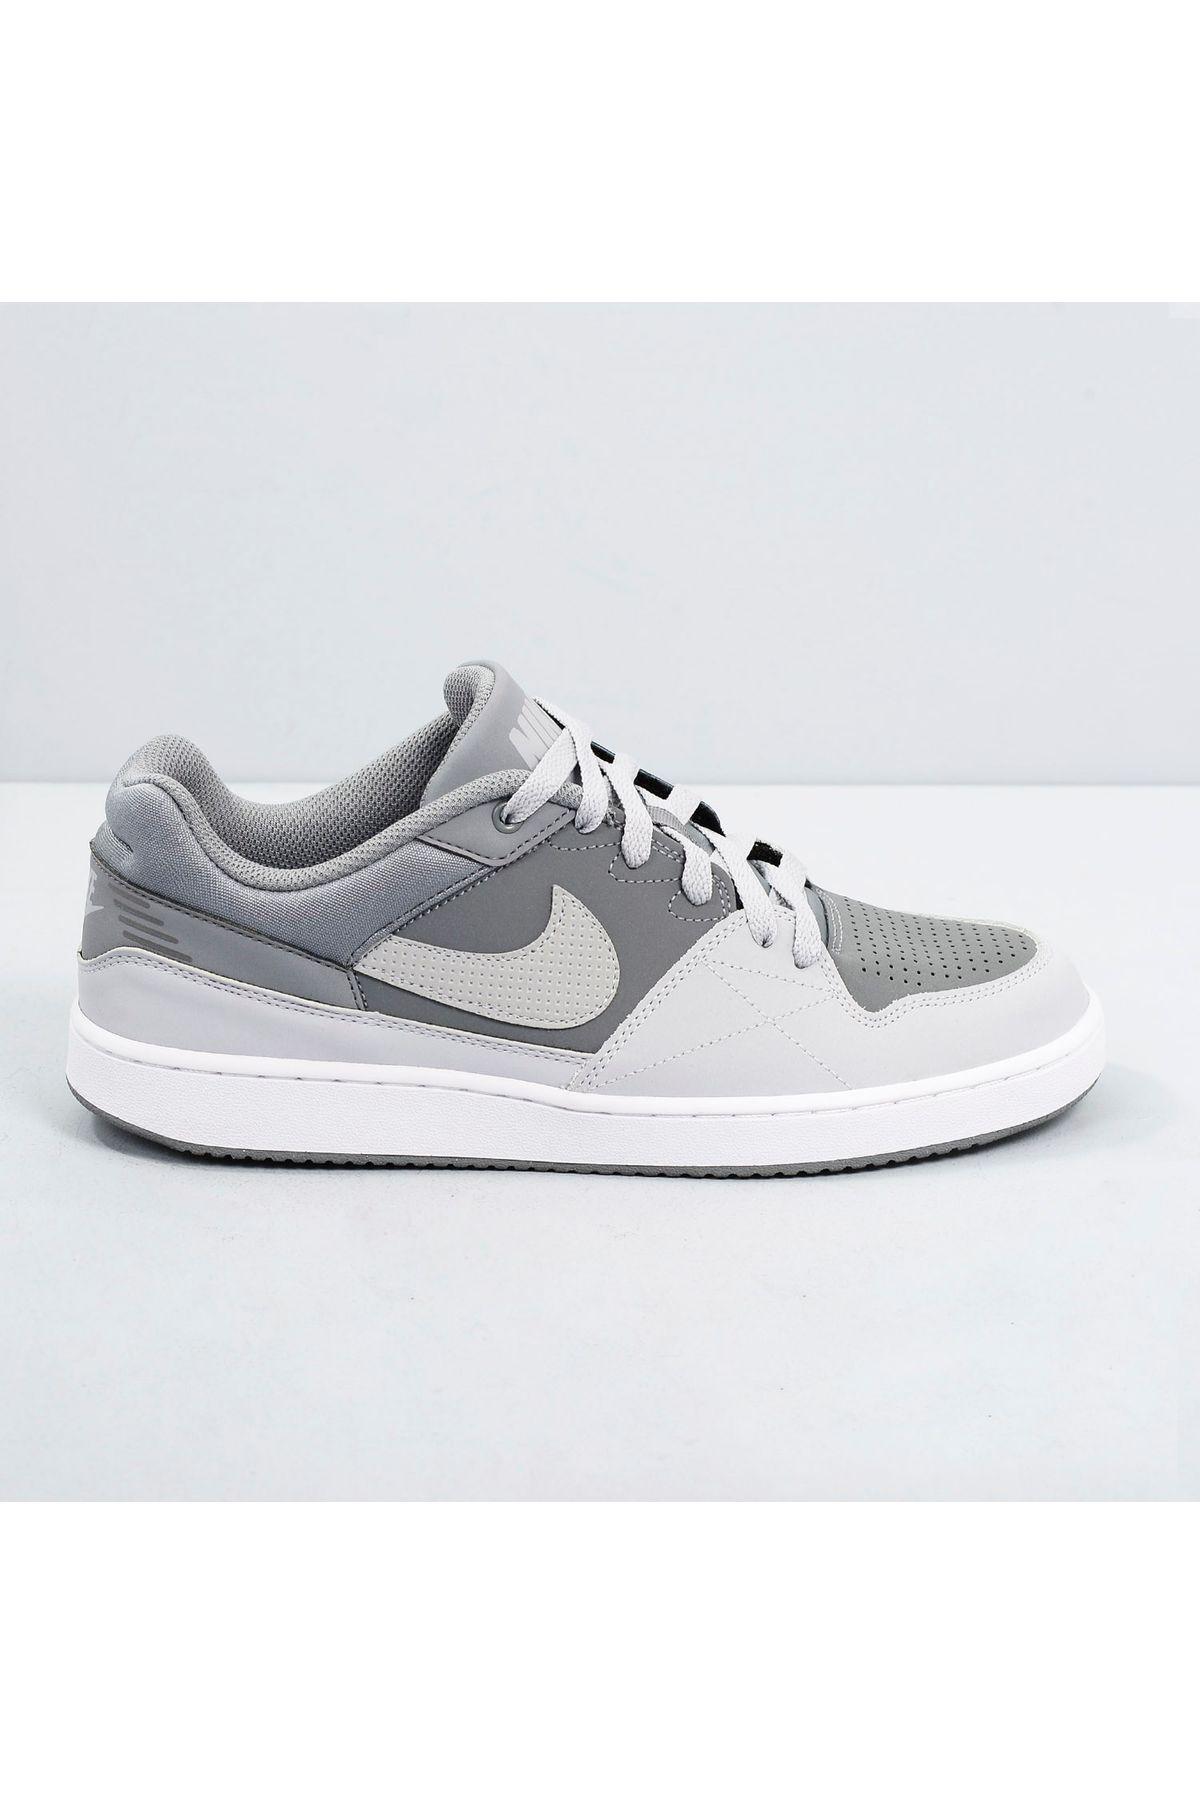 a88a763349a Tênis Nike Priority Low